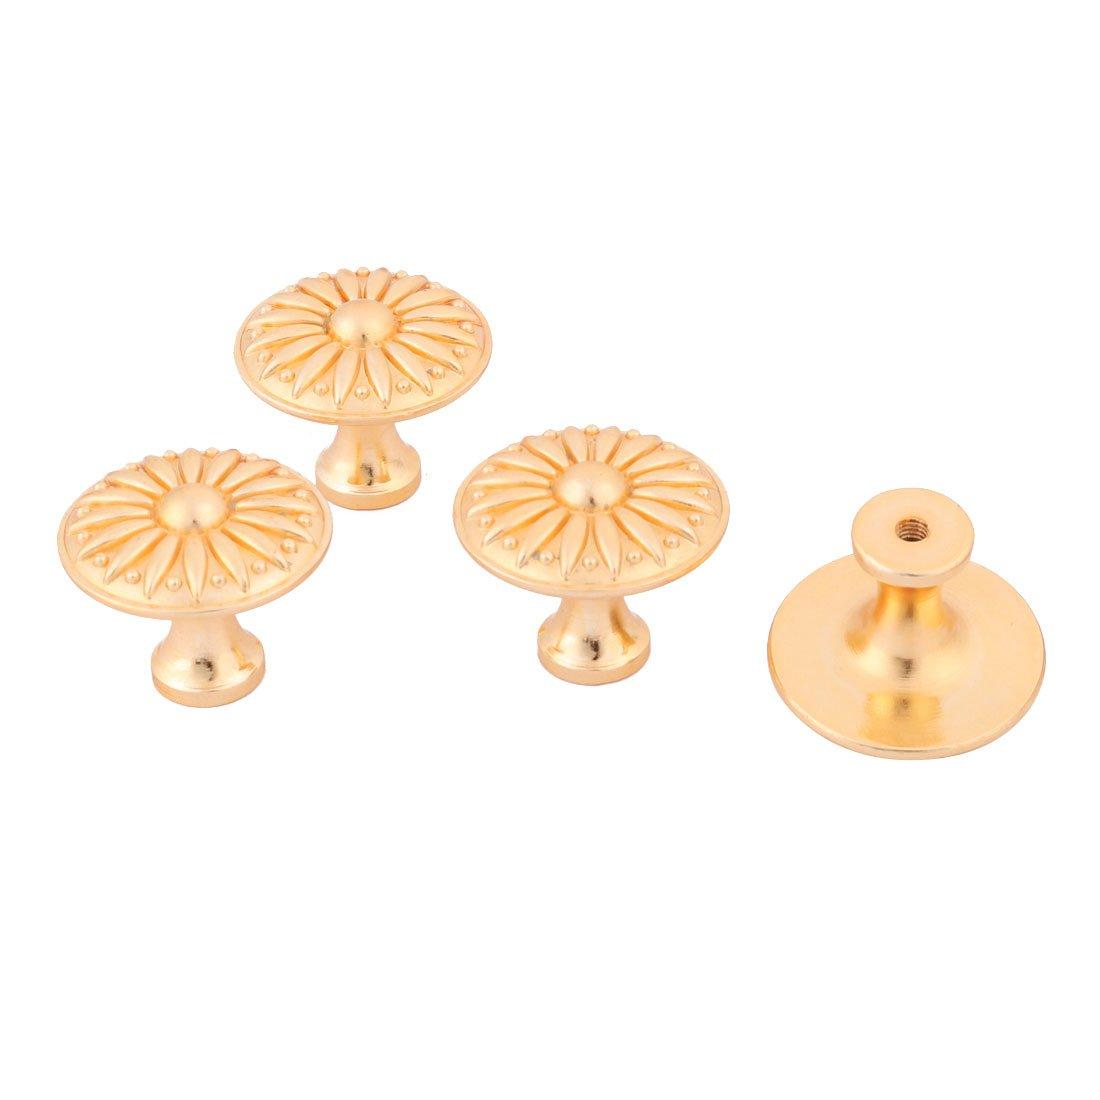 uxcell Metal Home Kitchen Door Cabinet Dresser Hardware Pull Handle Knob 4pcs Gold Tone